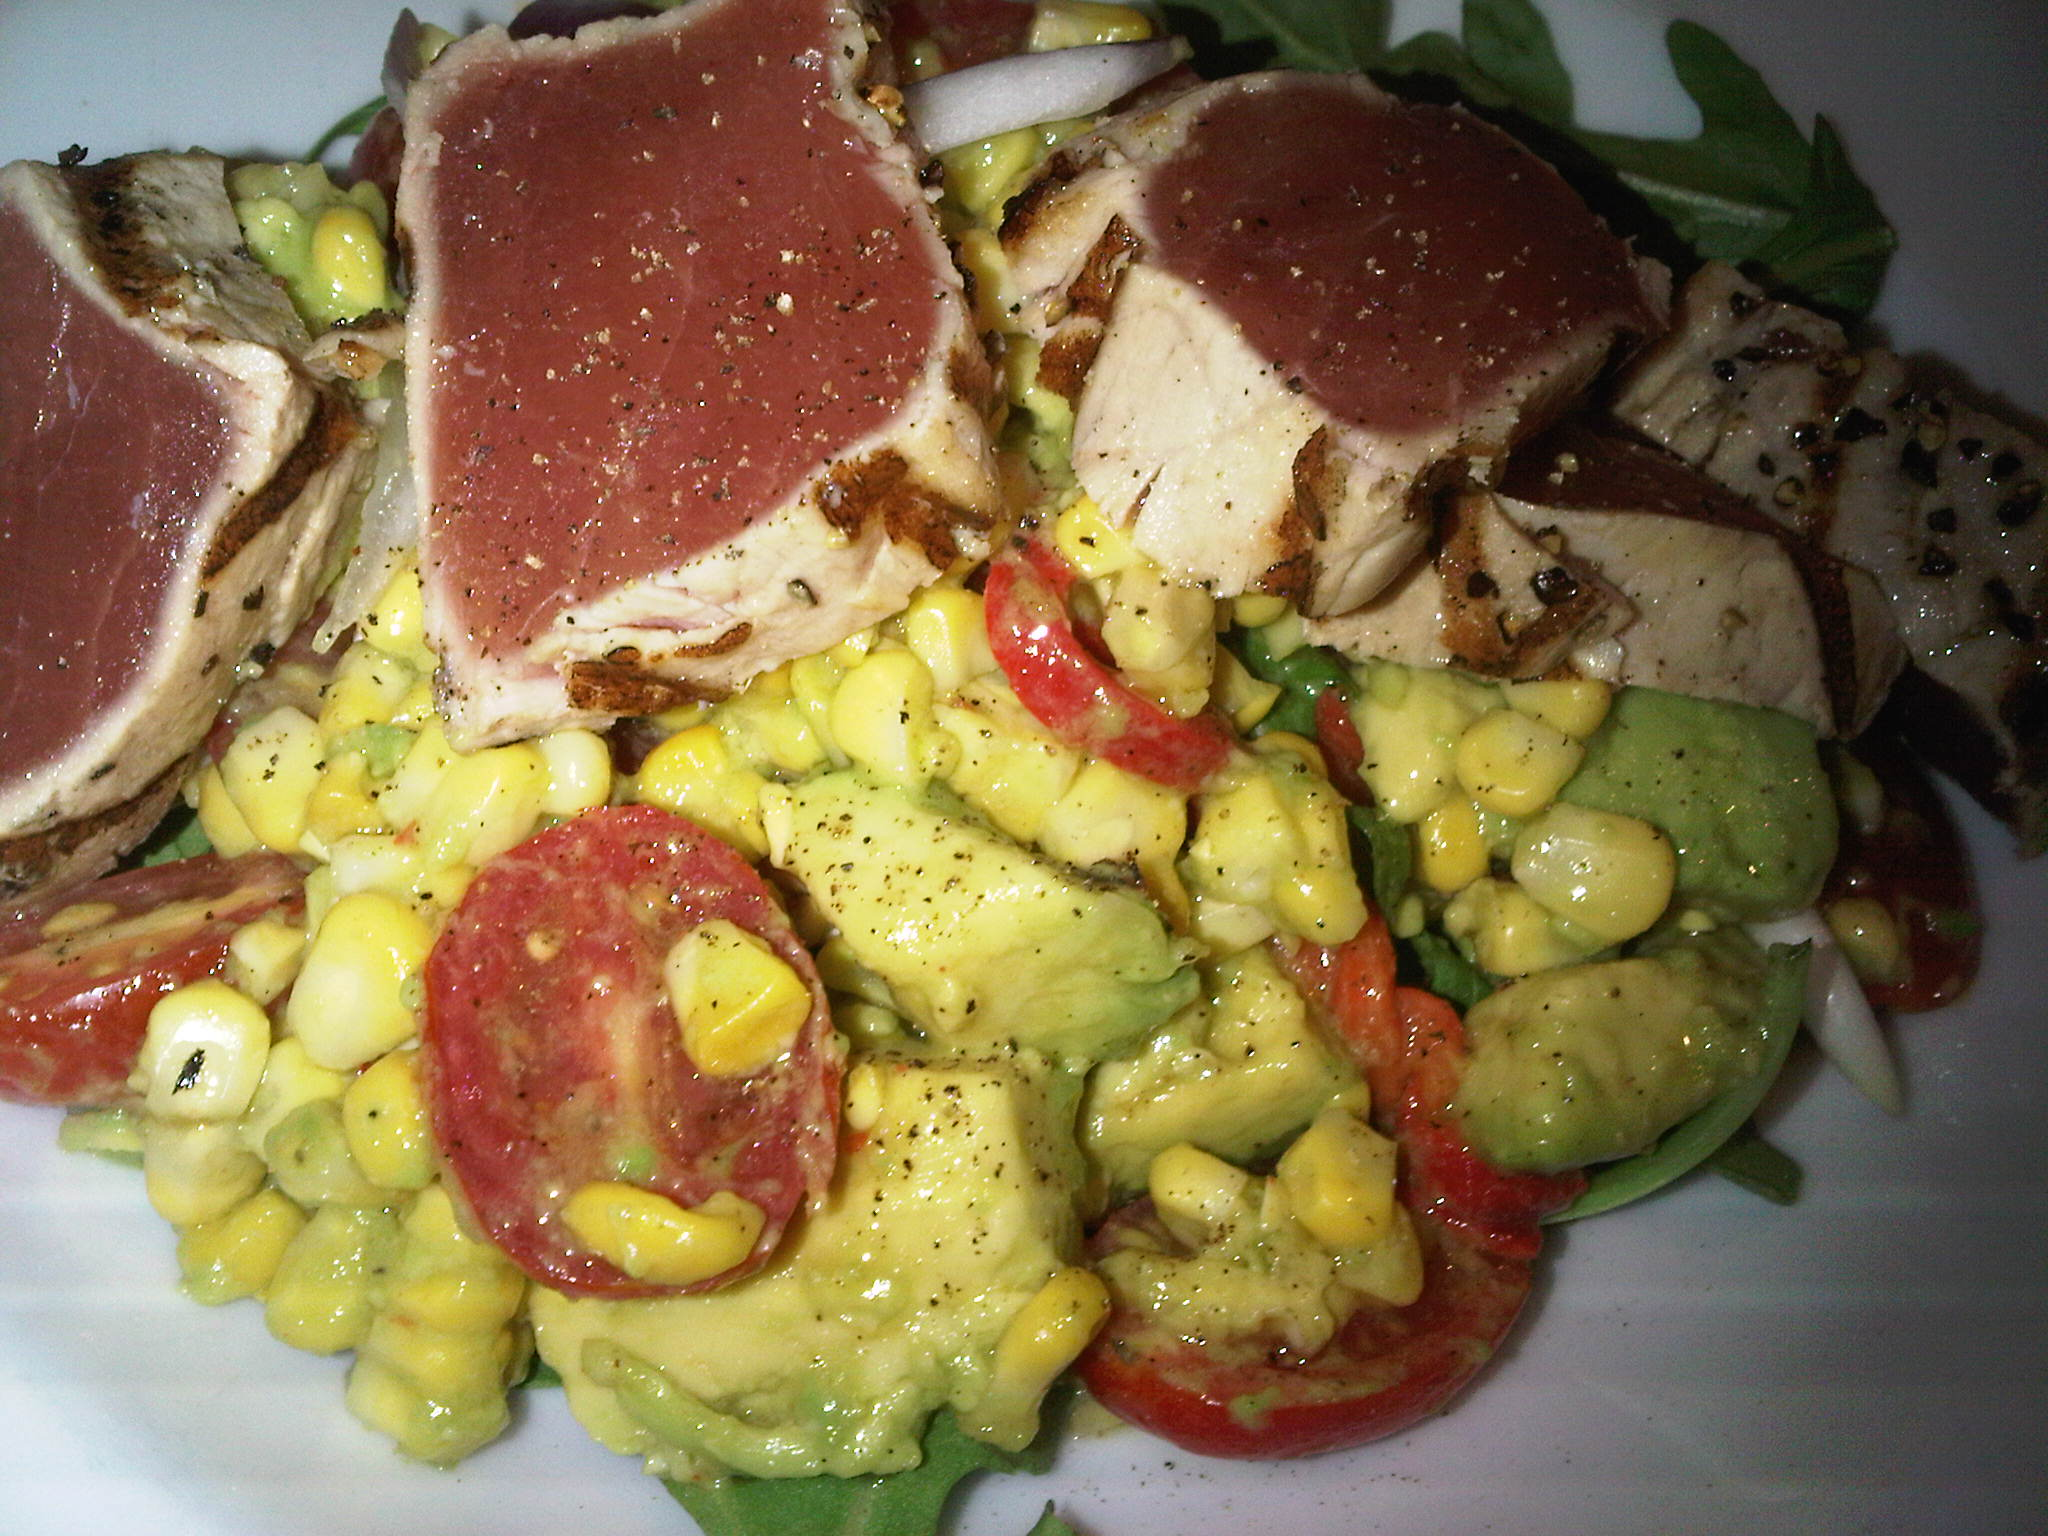 Aug 13 Brunch... Tuna with Avocado, Corn & Arugula